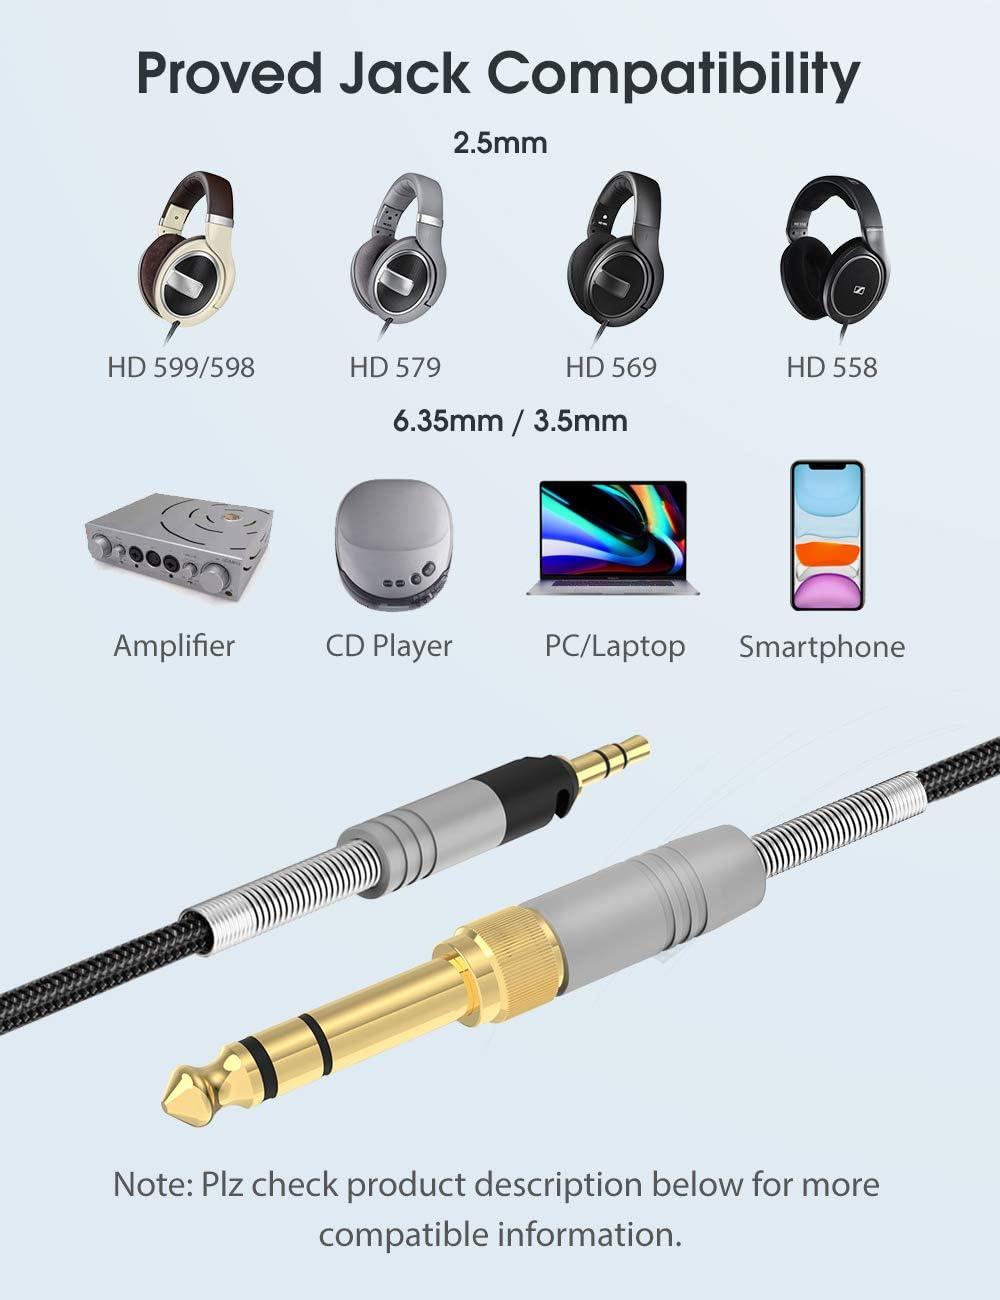 Mr Rex 2,5mm auf 3,5mm Kopfh/örer Ersatz-Audiokabel Klinkenkabel Kompatibel mit Bose 700 QuietComfort QC35 QC25 Kopfh/örer JBL E45BT E55BT E65BTNC /& AKG Y55 Y50 Y45BT Kopfh/örer 1.5m // 5ft, Schwarz